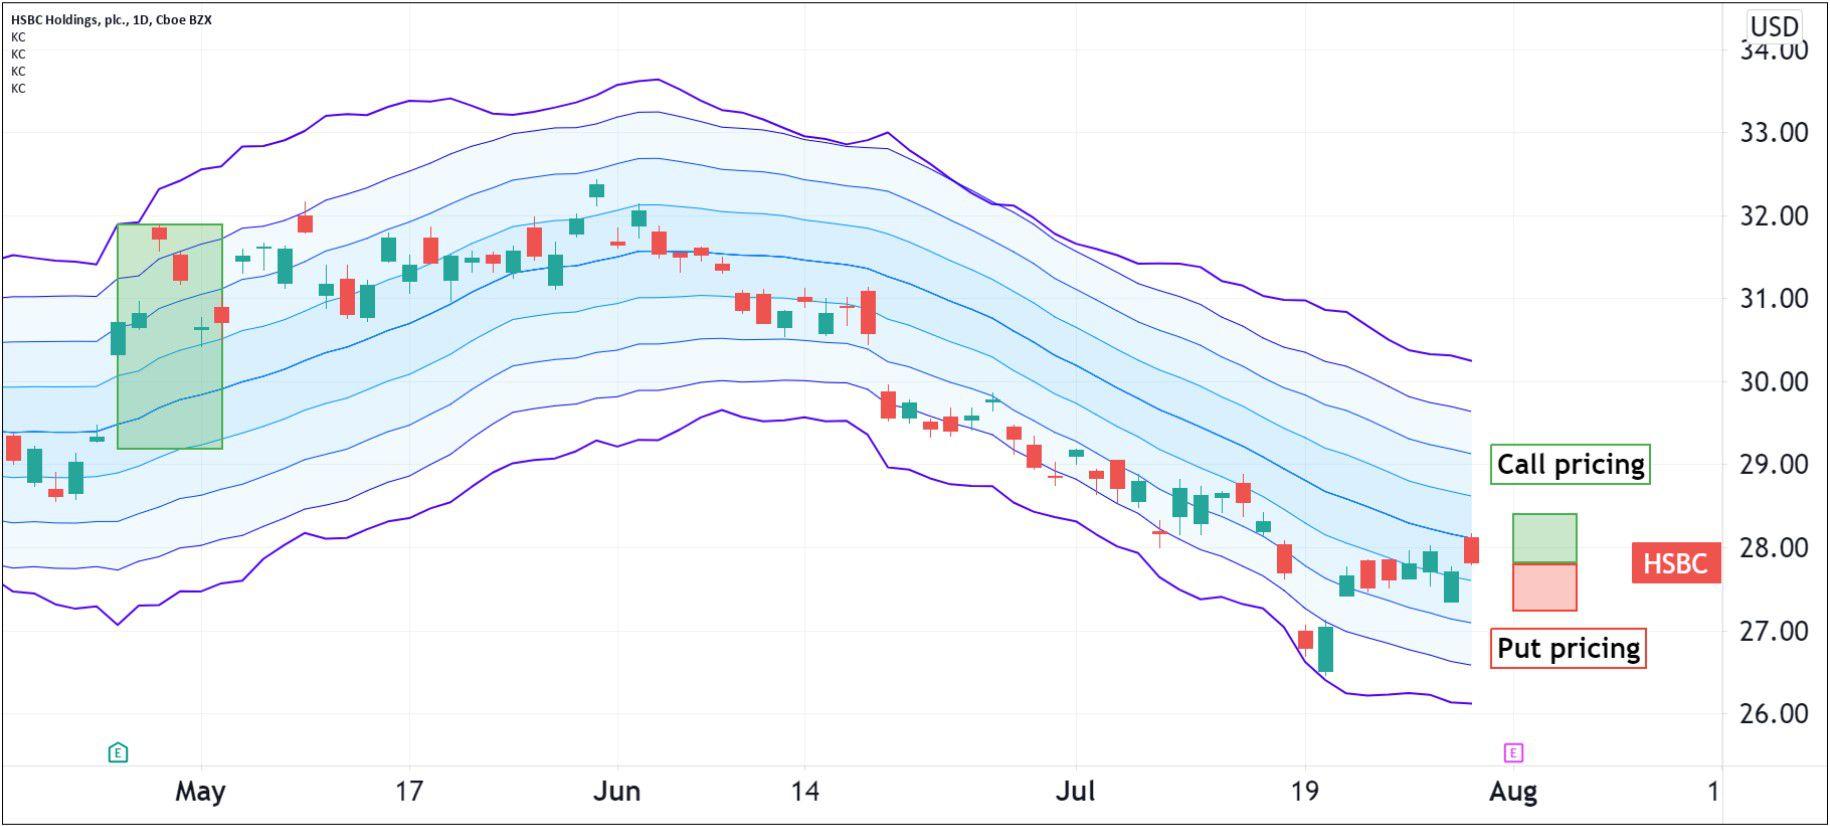 Option pricing for HSBC Holdings (HSBC)